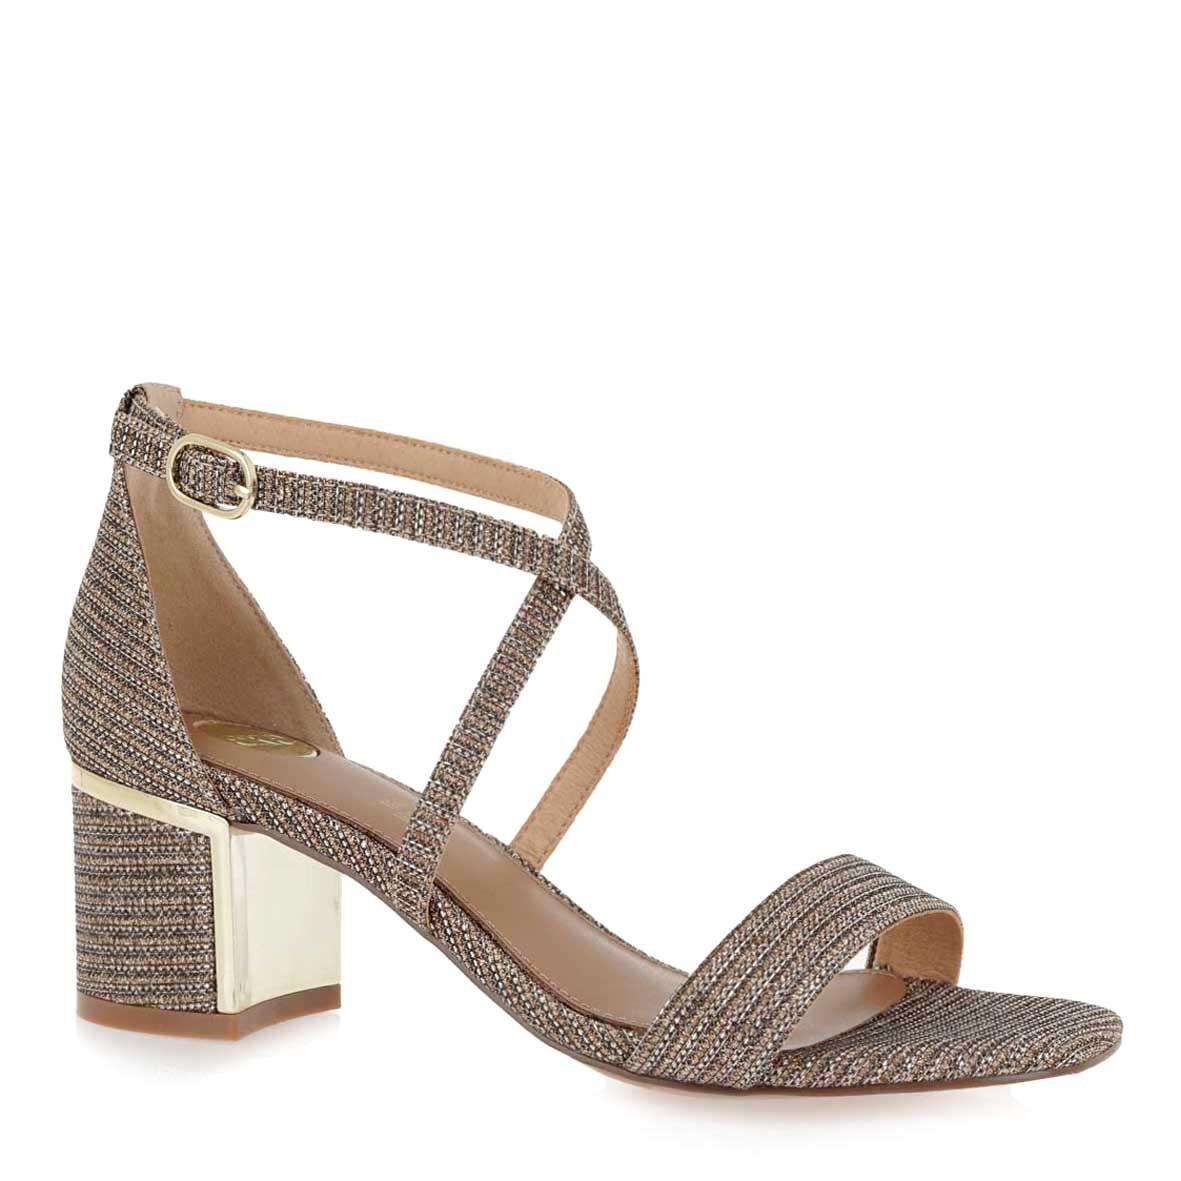 EXE Shoes Πέδιλα Γυναικεία ISABEL-560 Ρόζ Χρυσό Glitter K4700560376S